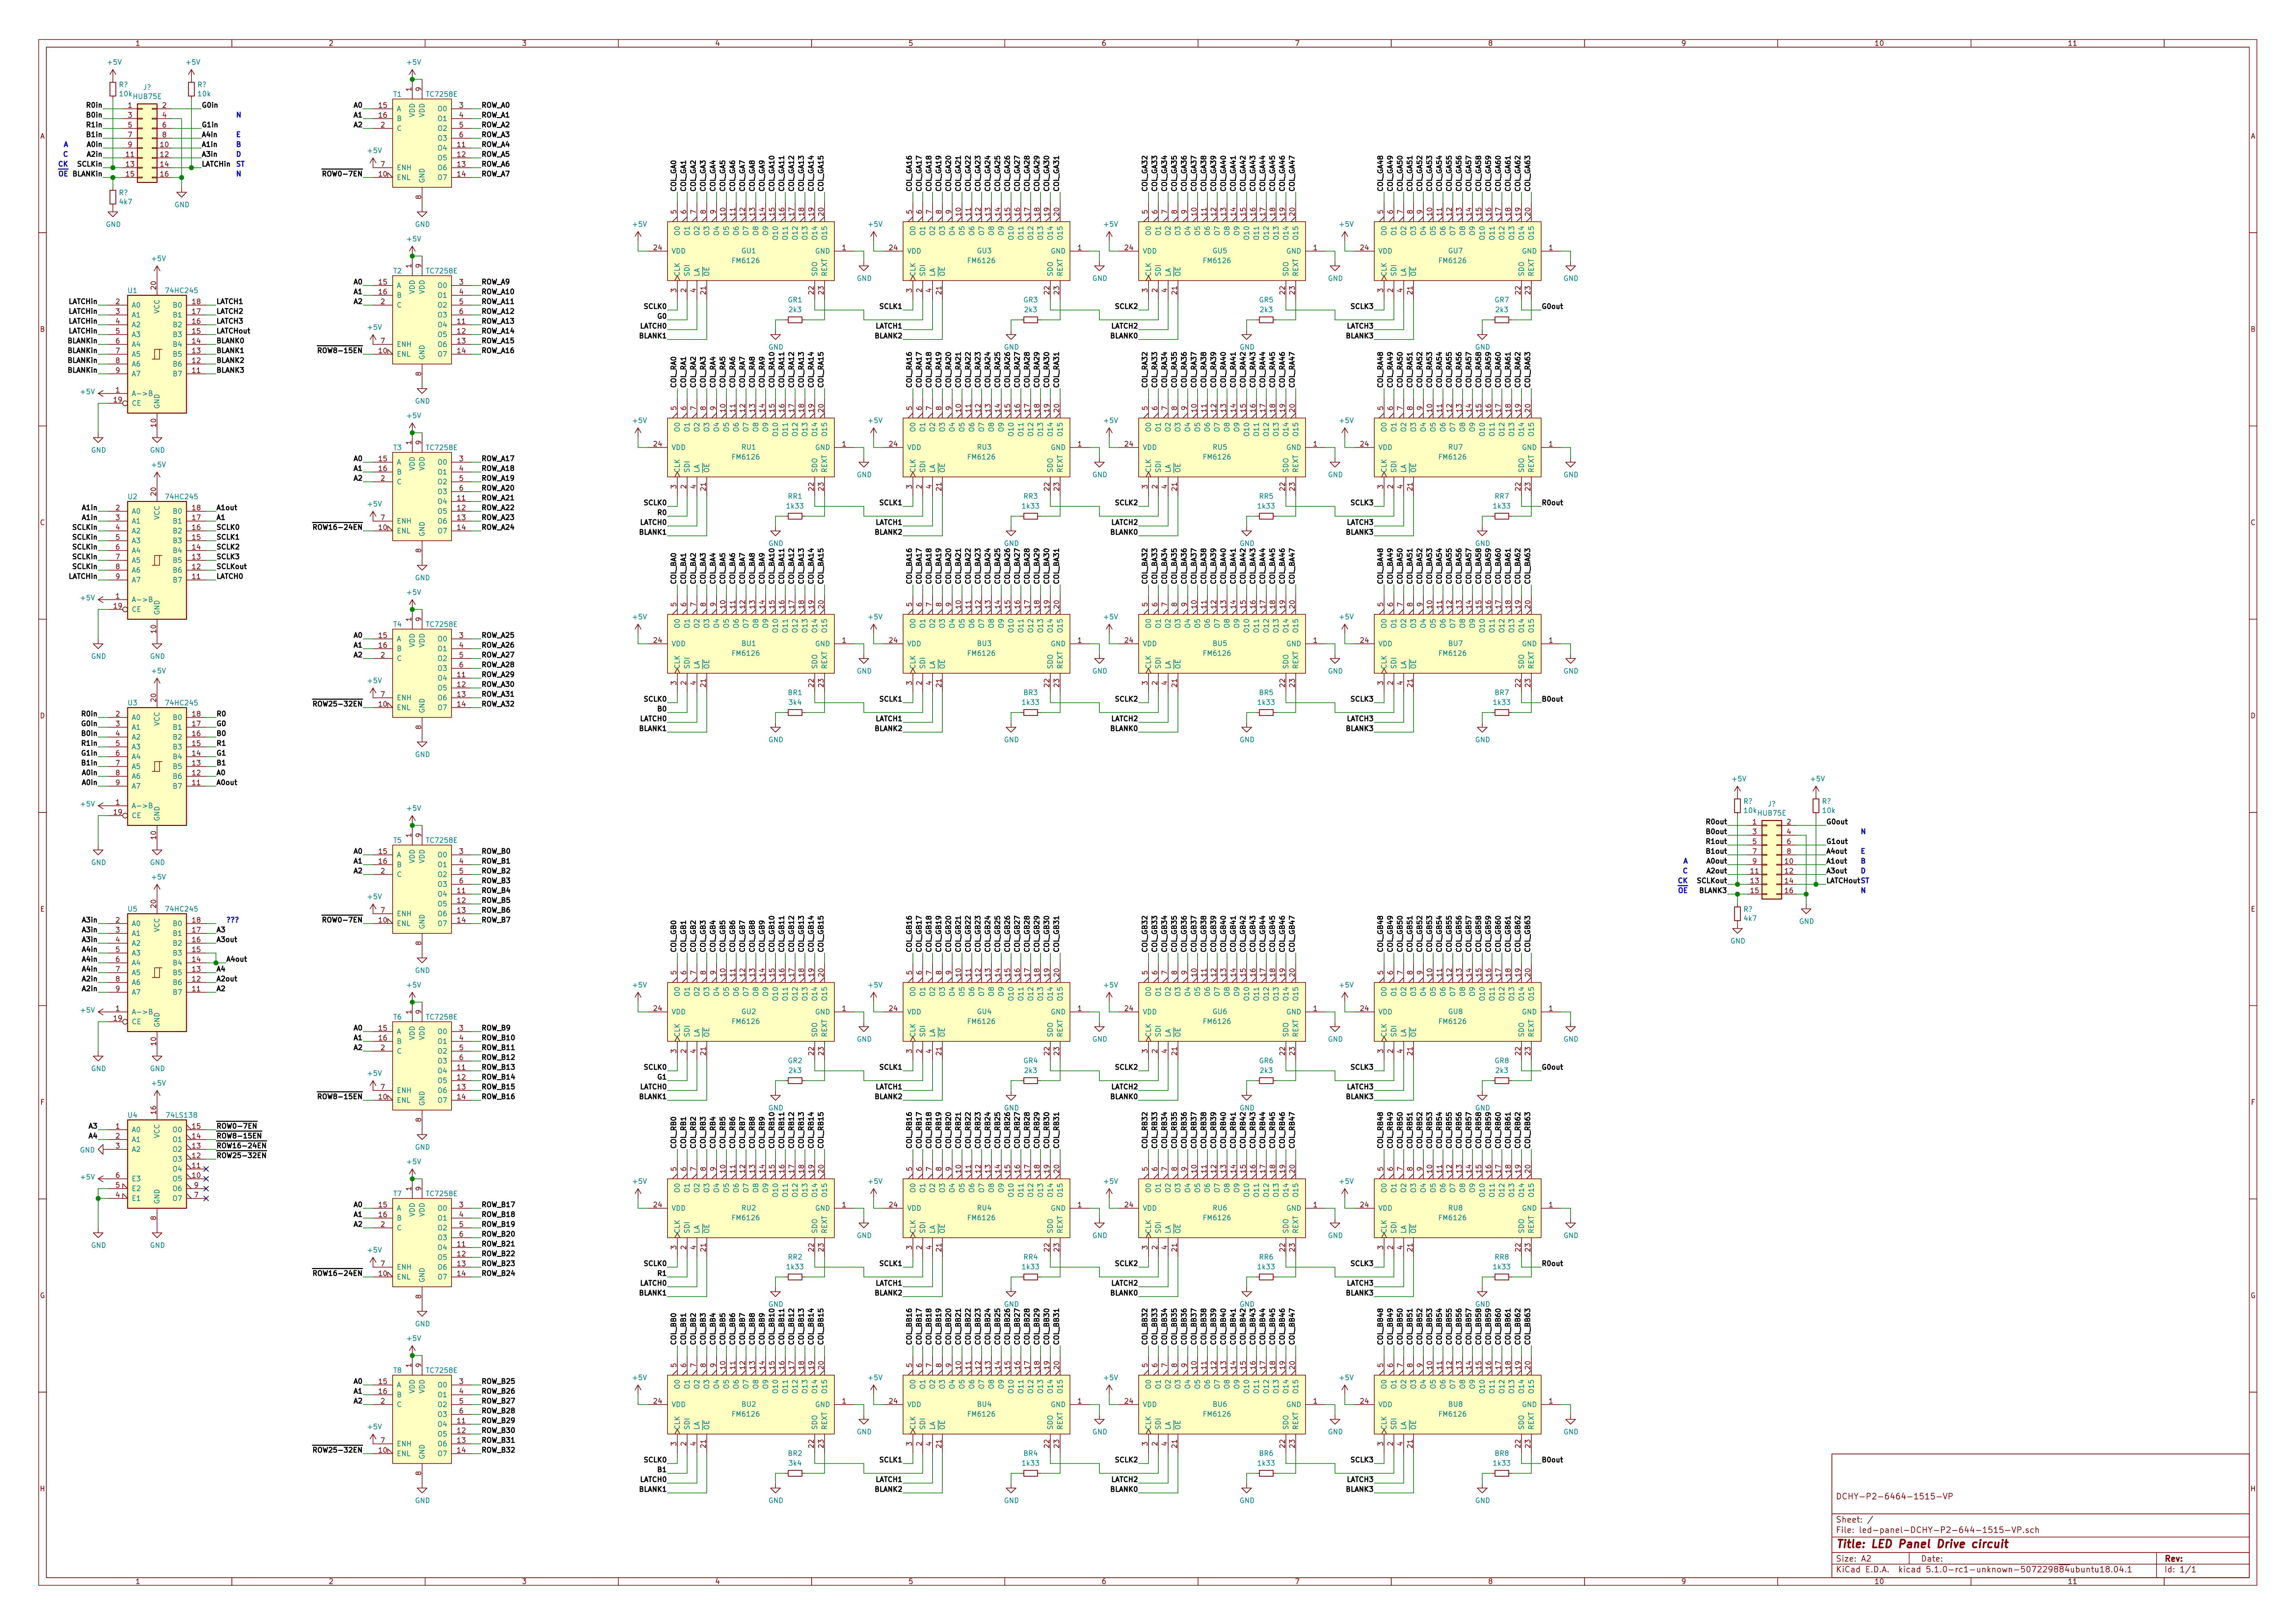 led-panel-DCHY-P2-644-1515-VP-sch